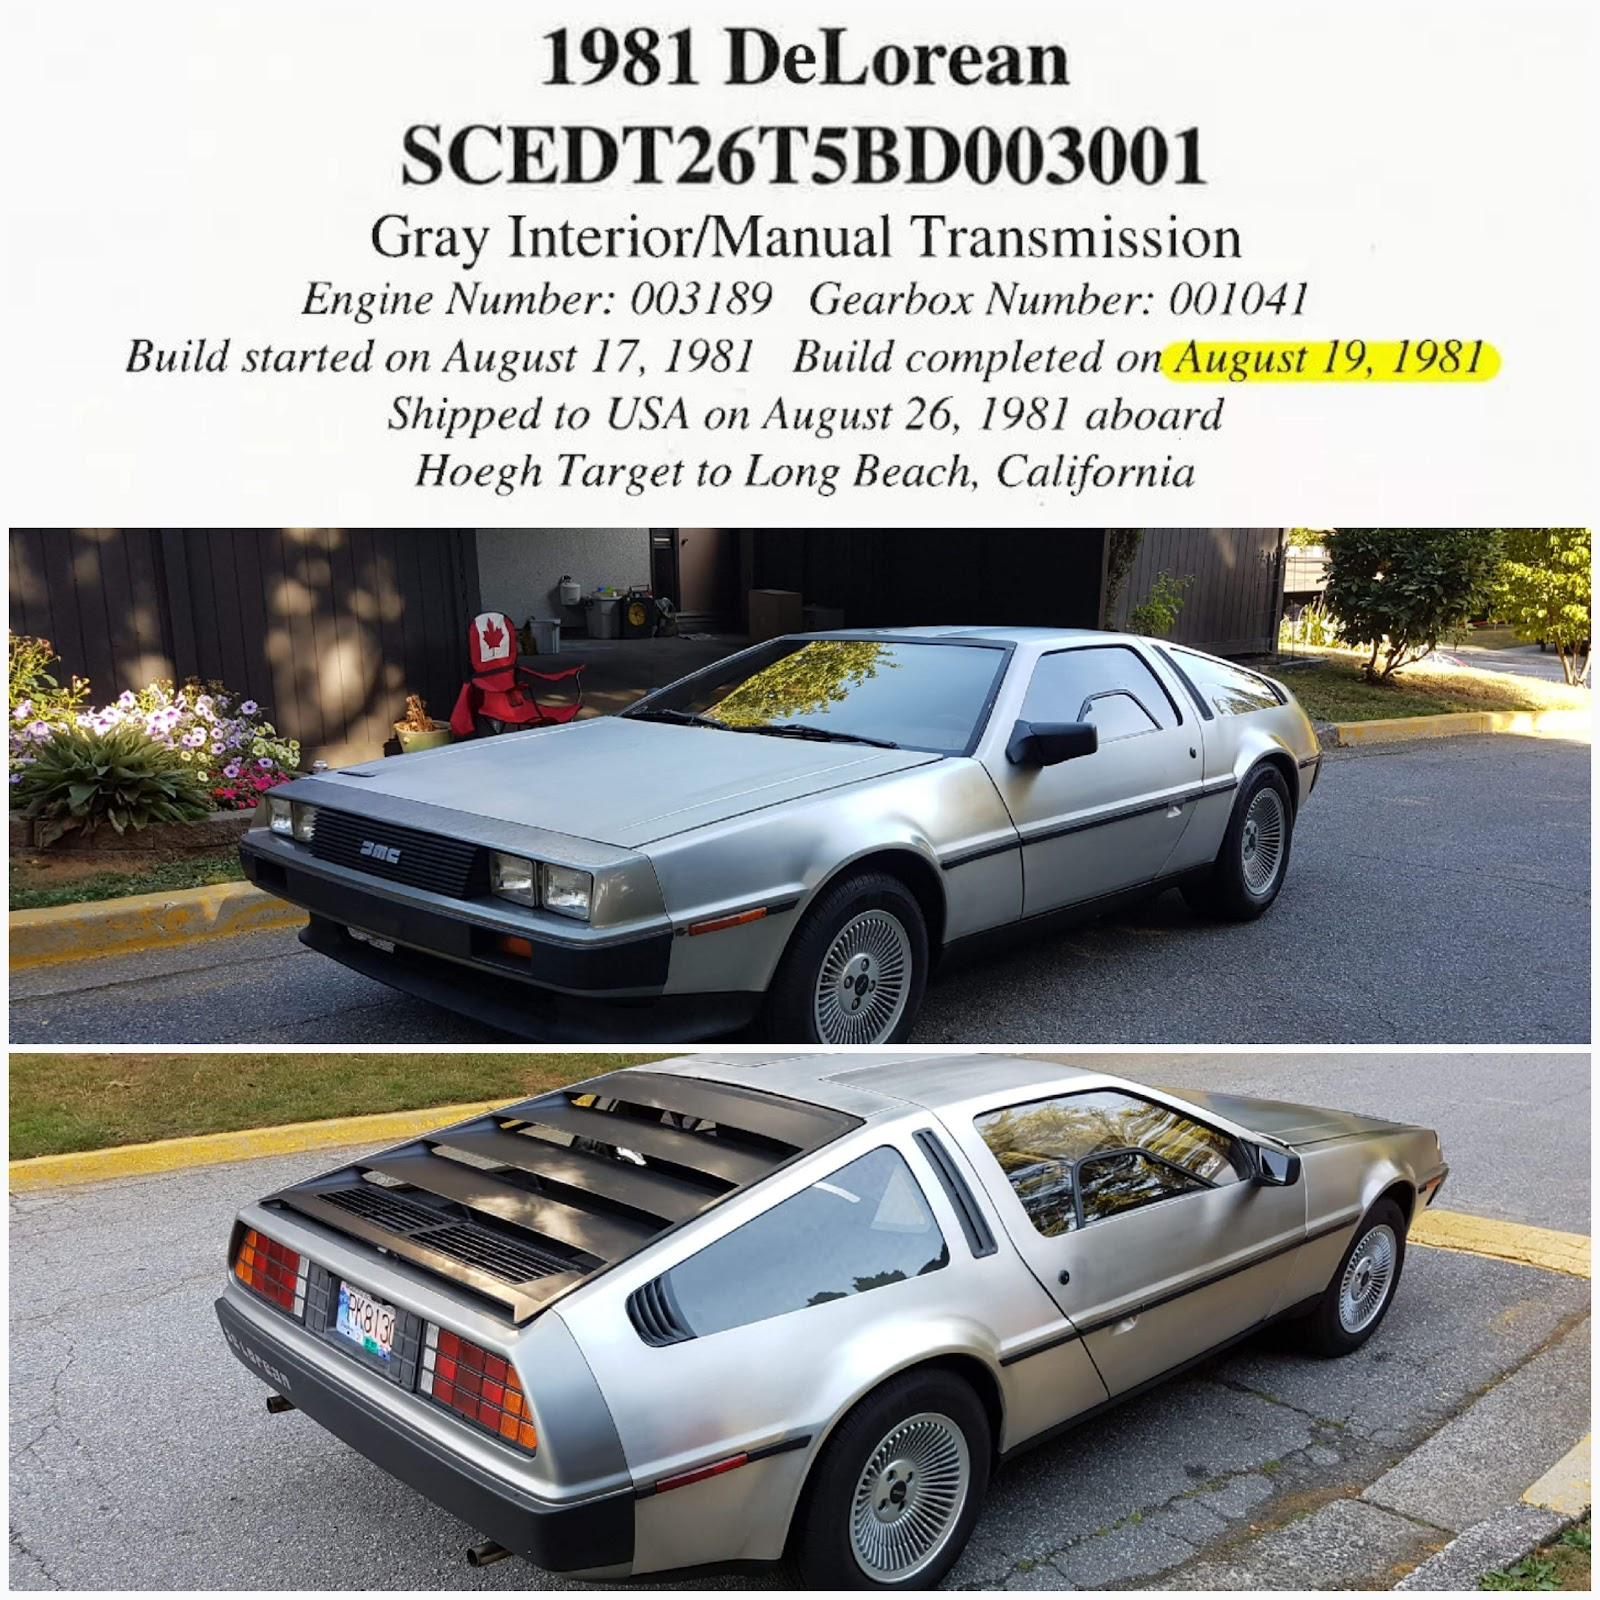 SCEDT26T5BD003001 - SCEDT26T5BD003001-car.jpg